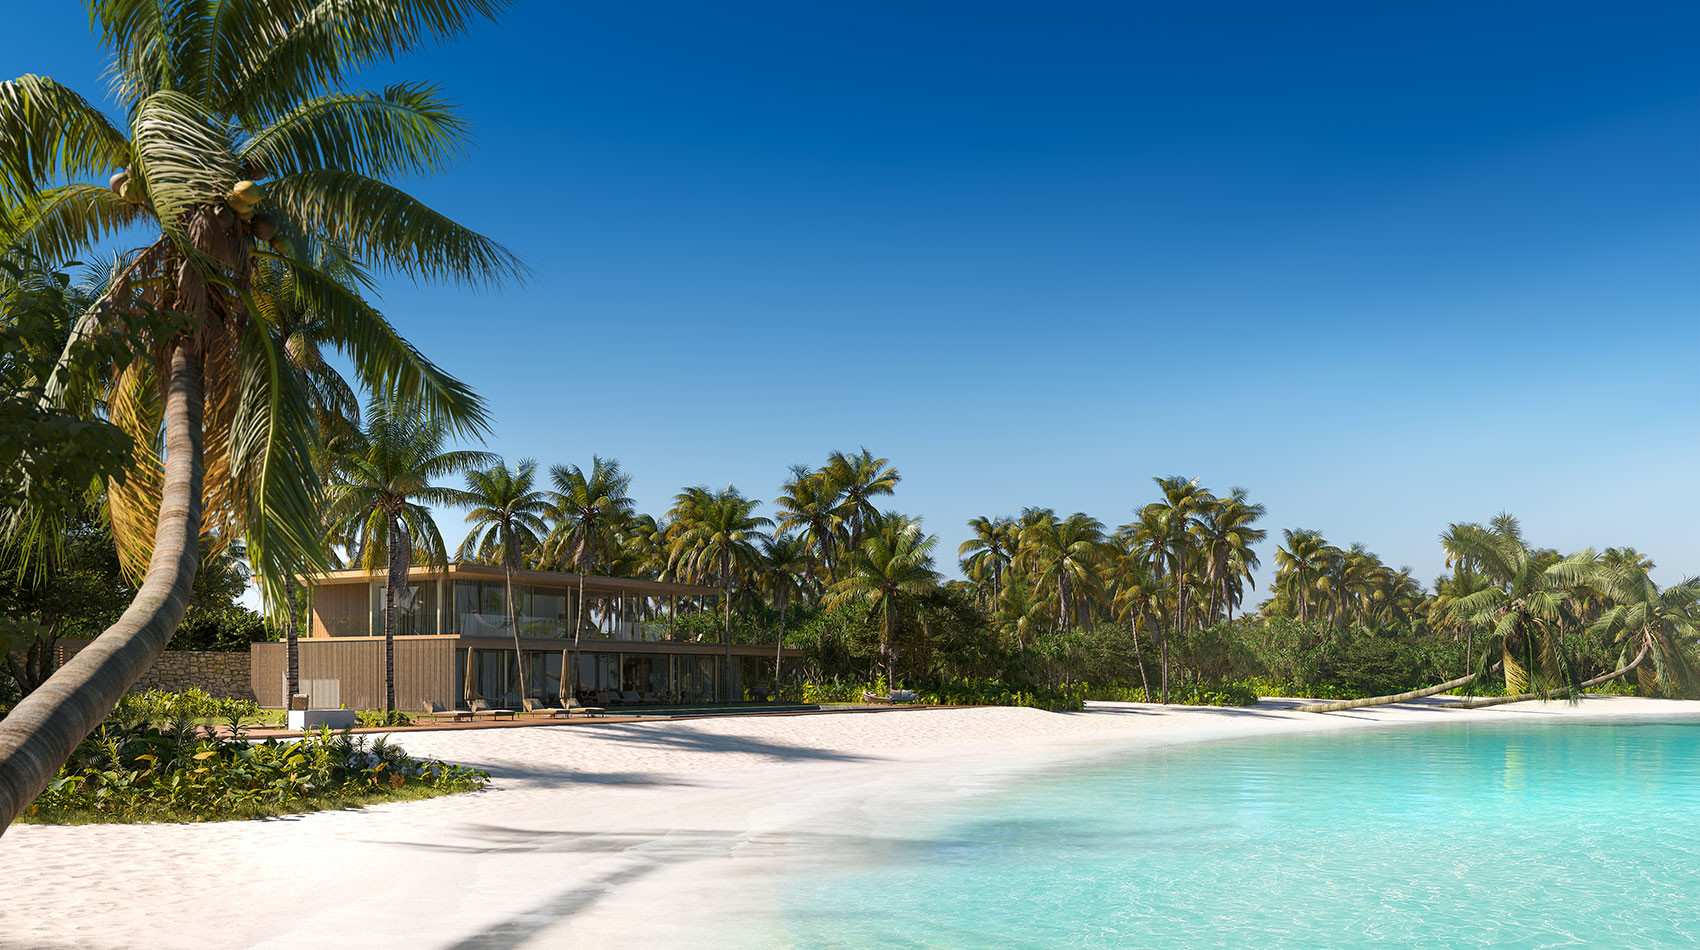 news-main-now-open-patina-maldives-fari-islands.1621422975.jpg